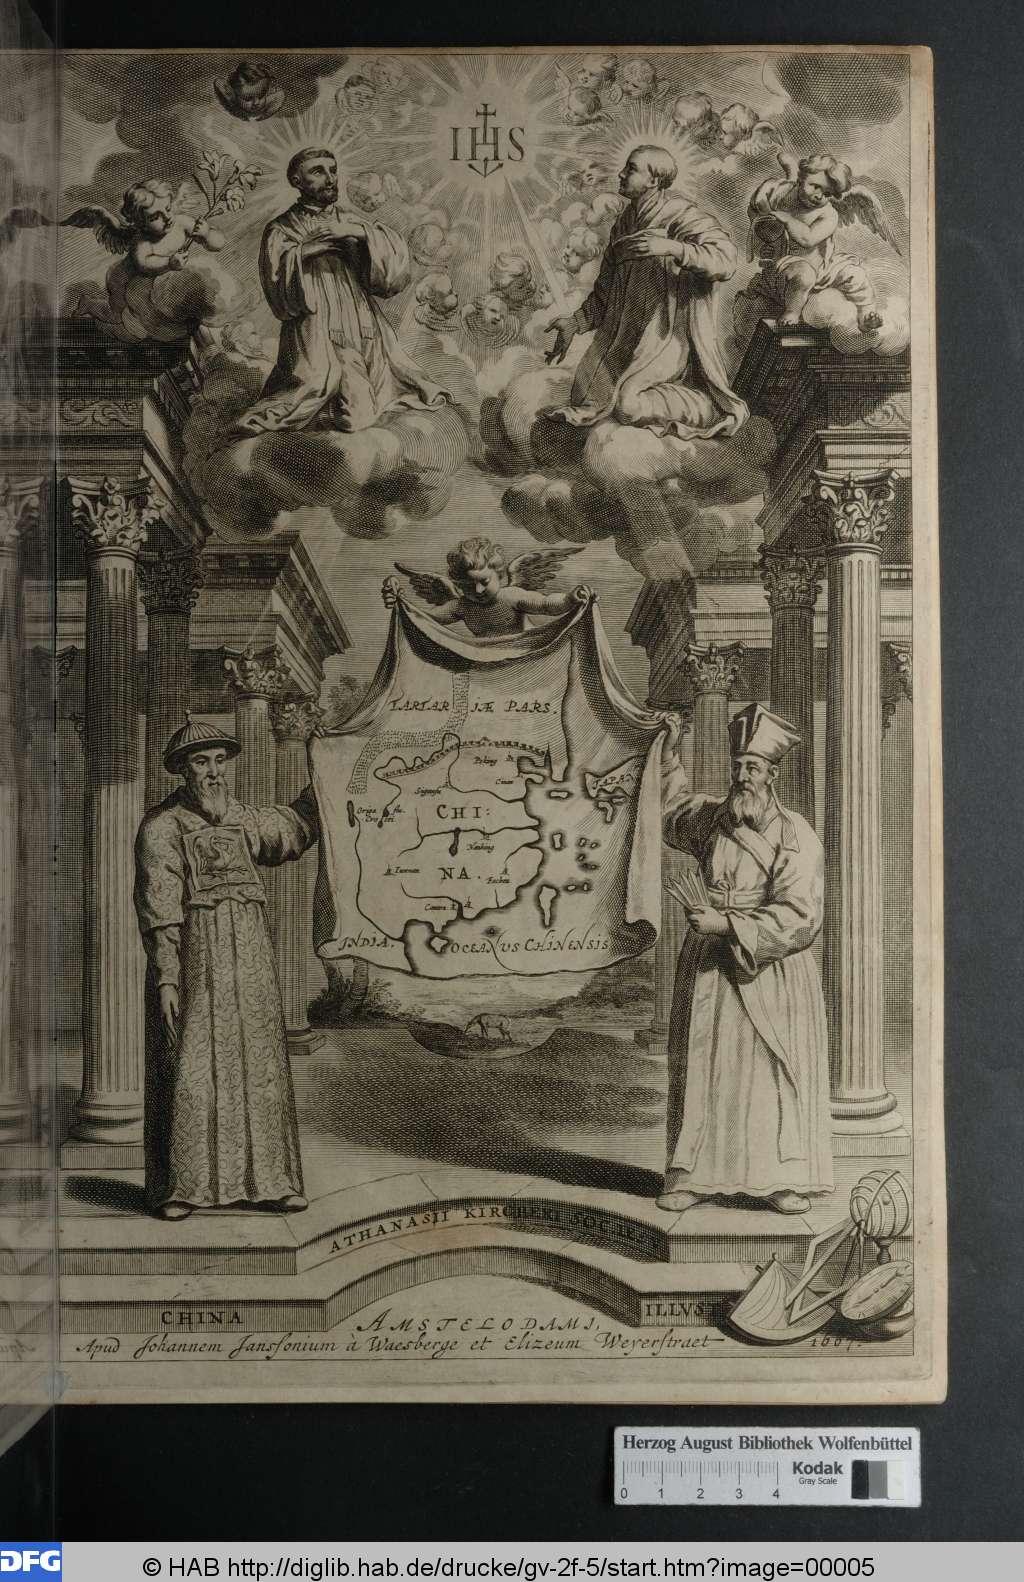 Kircher: China illustrata (1667) | © Herzog August Bibliothek Wolfenbüttel <http://diglib.hab.de/drucke/gv-2f-5/start.htm>